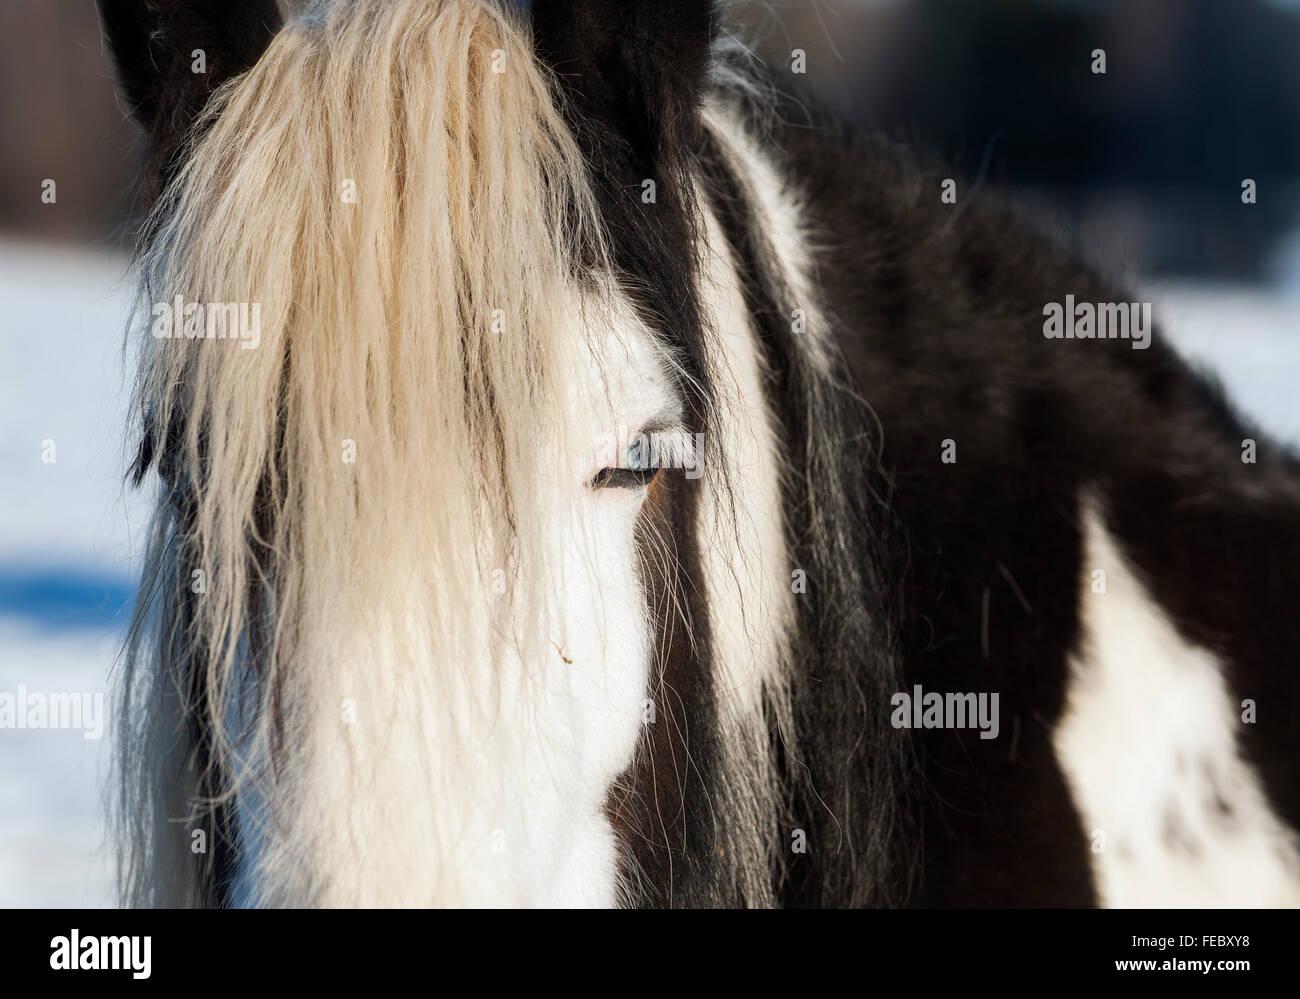 Gypsy Horse - Stock Image